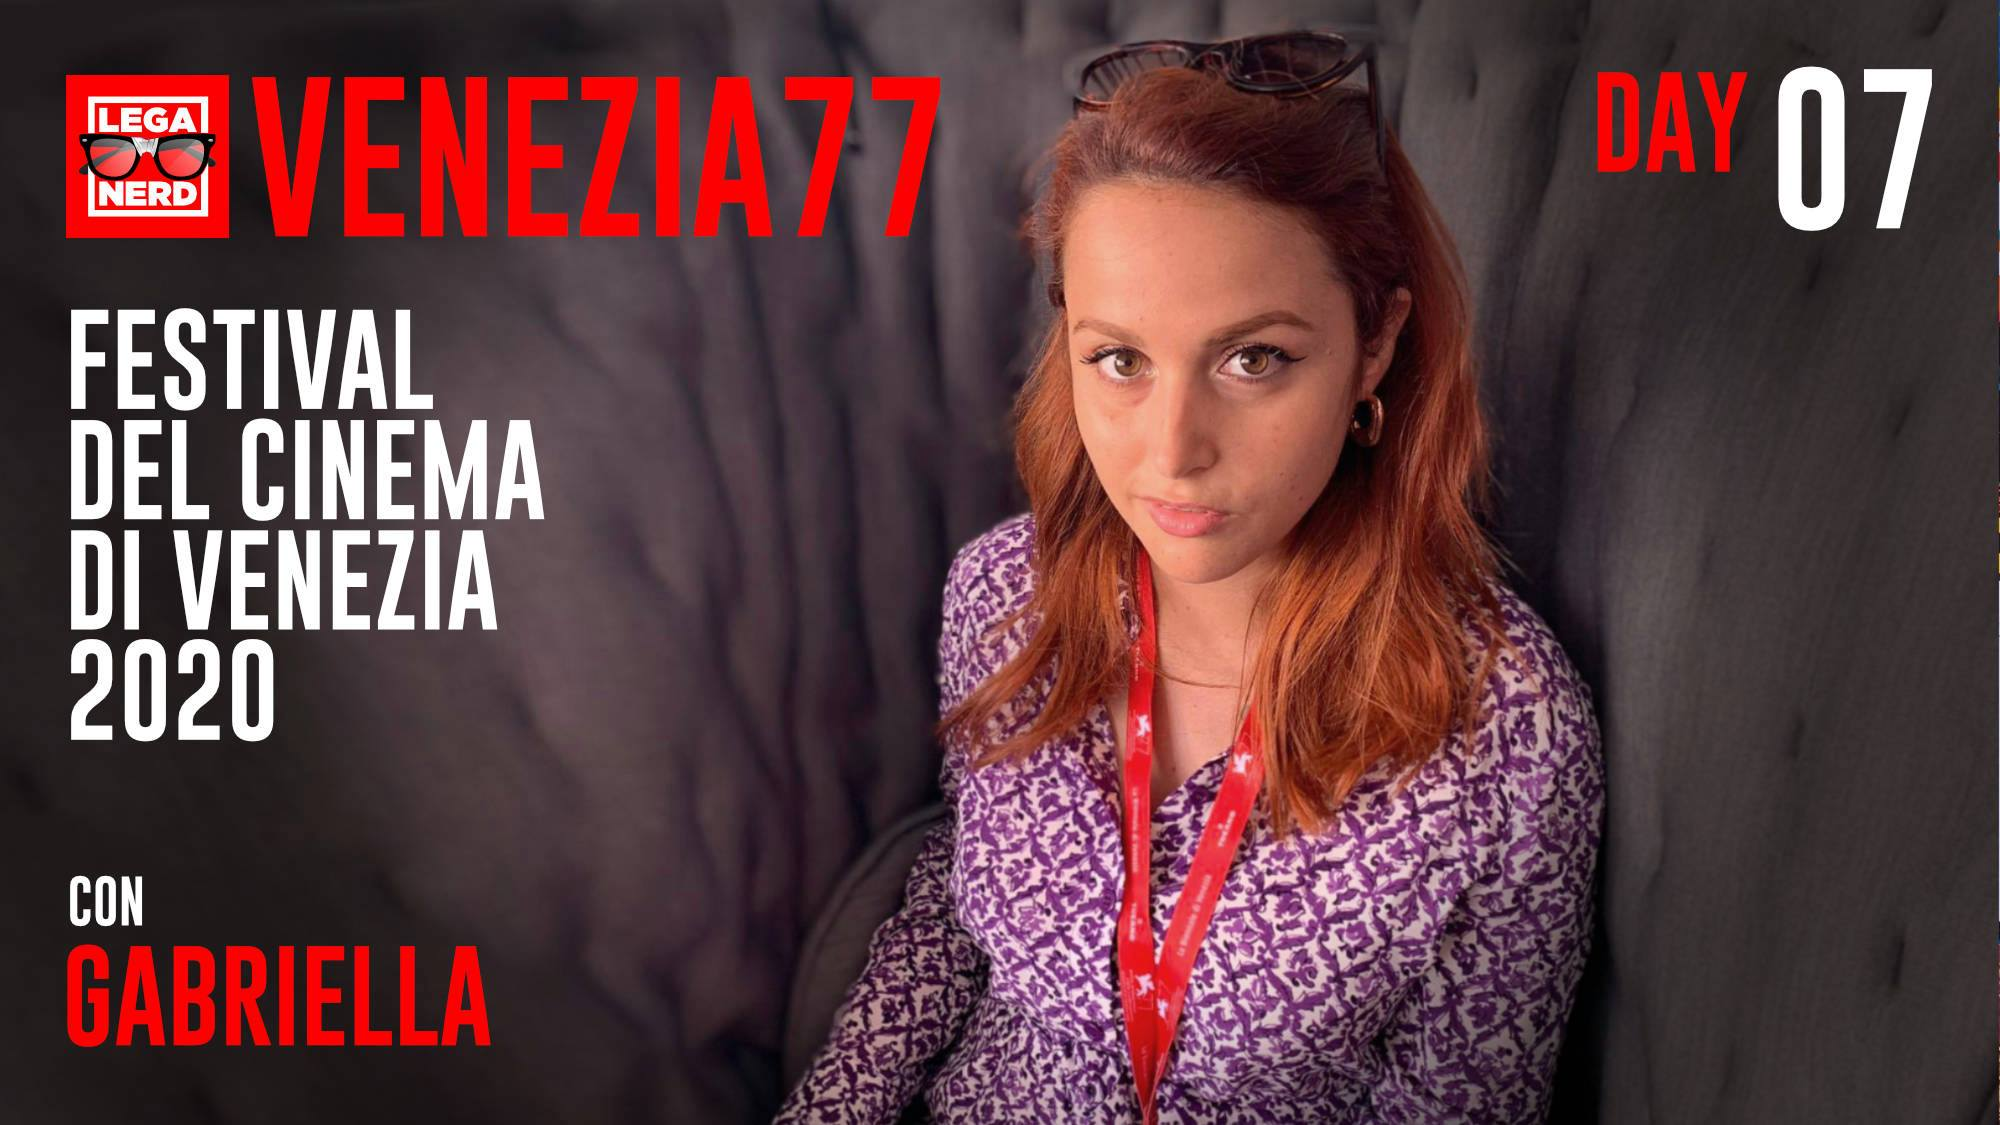 Venezia 77 recap live day 7